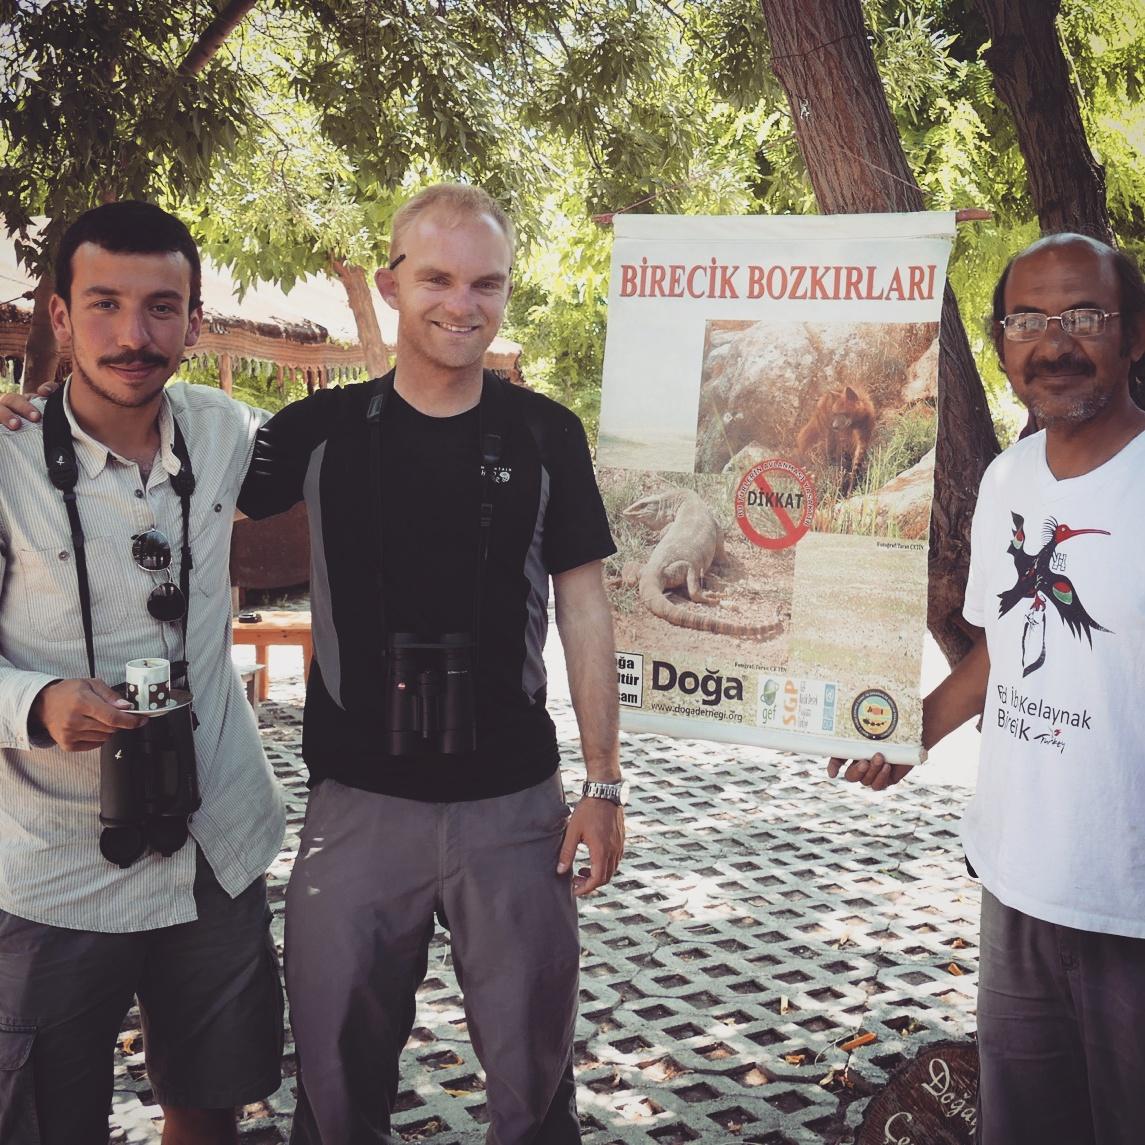 Emin, Noah, and Mustafa at the Bald Ibis Cafe. Noah Strycker